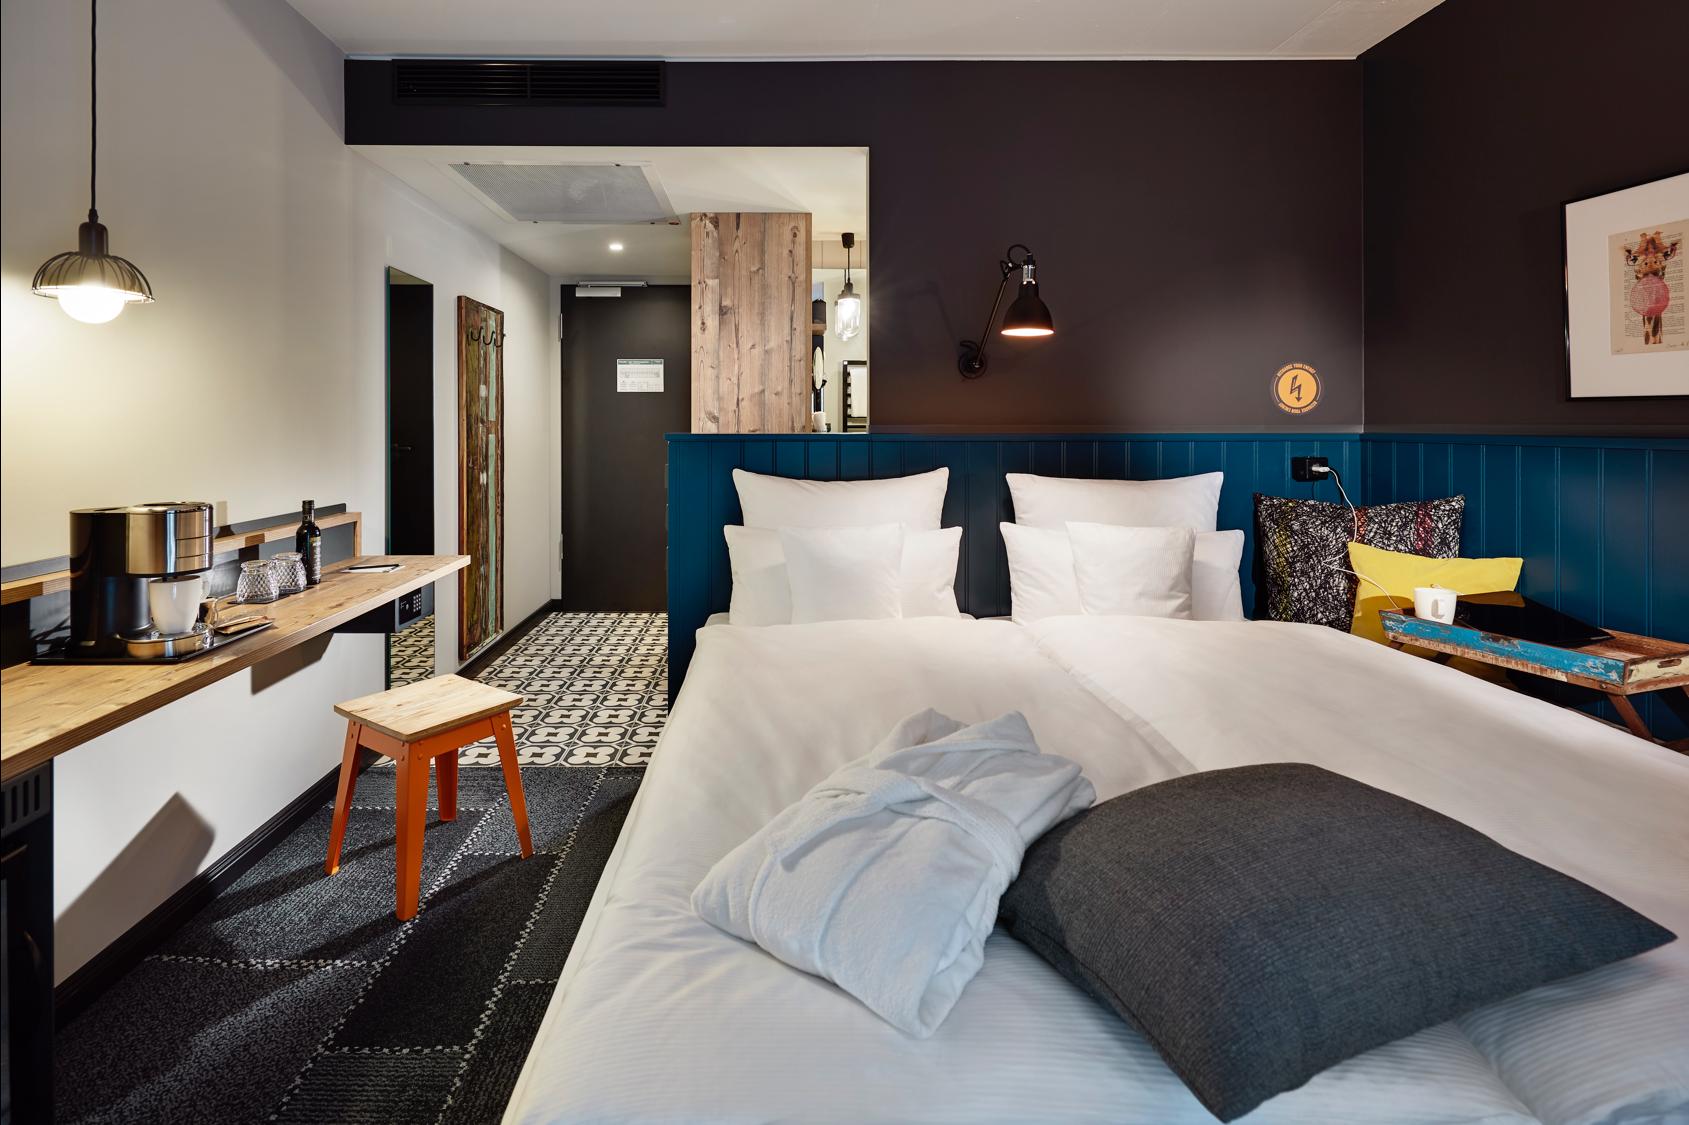 insideflyer adventskalender 2 dezember gewinnt einen hotelaufenthalt insideflyer de. Black Bedroom Furniture Sets. Home Design Ideas